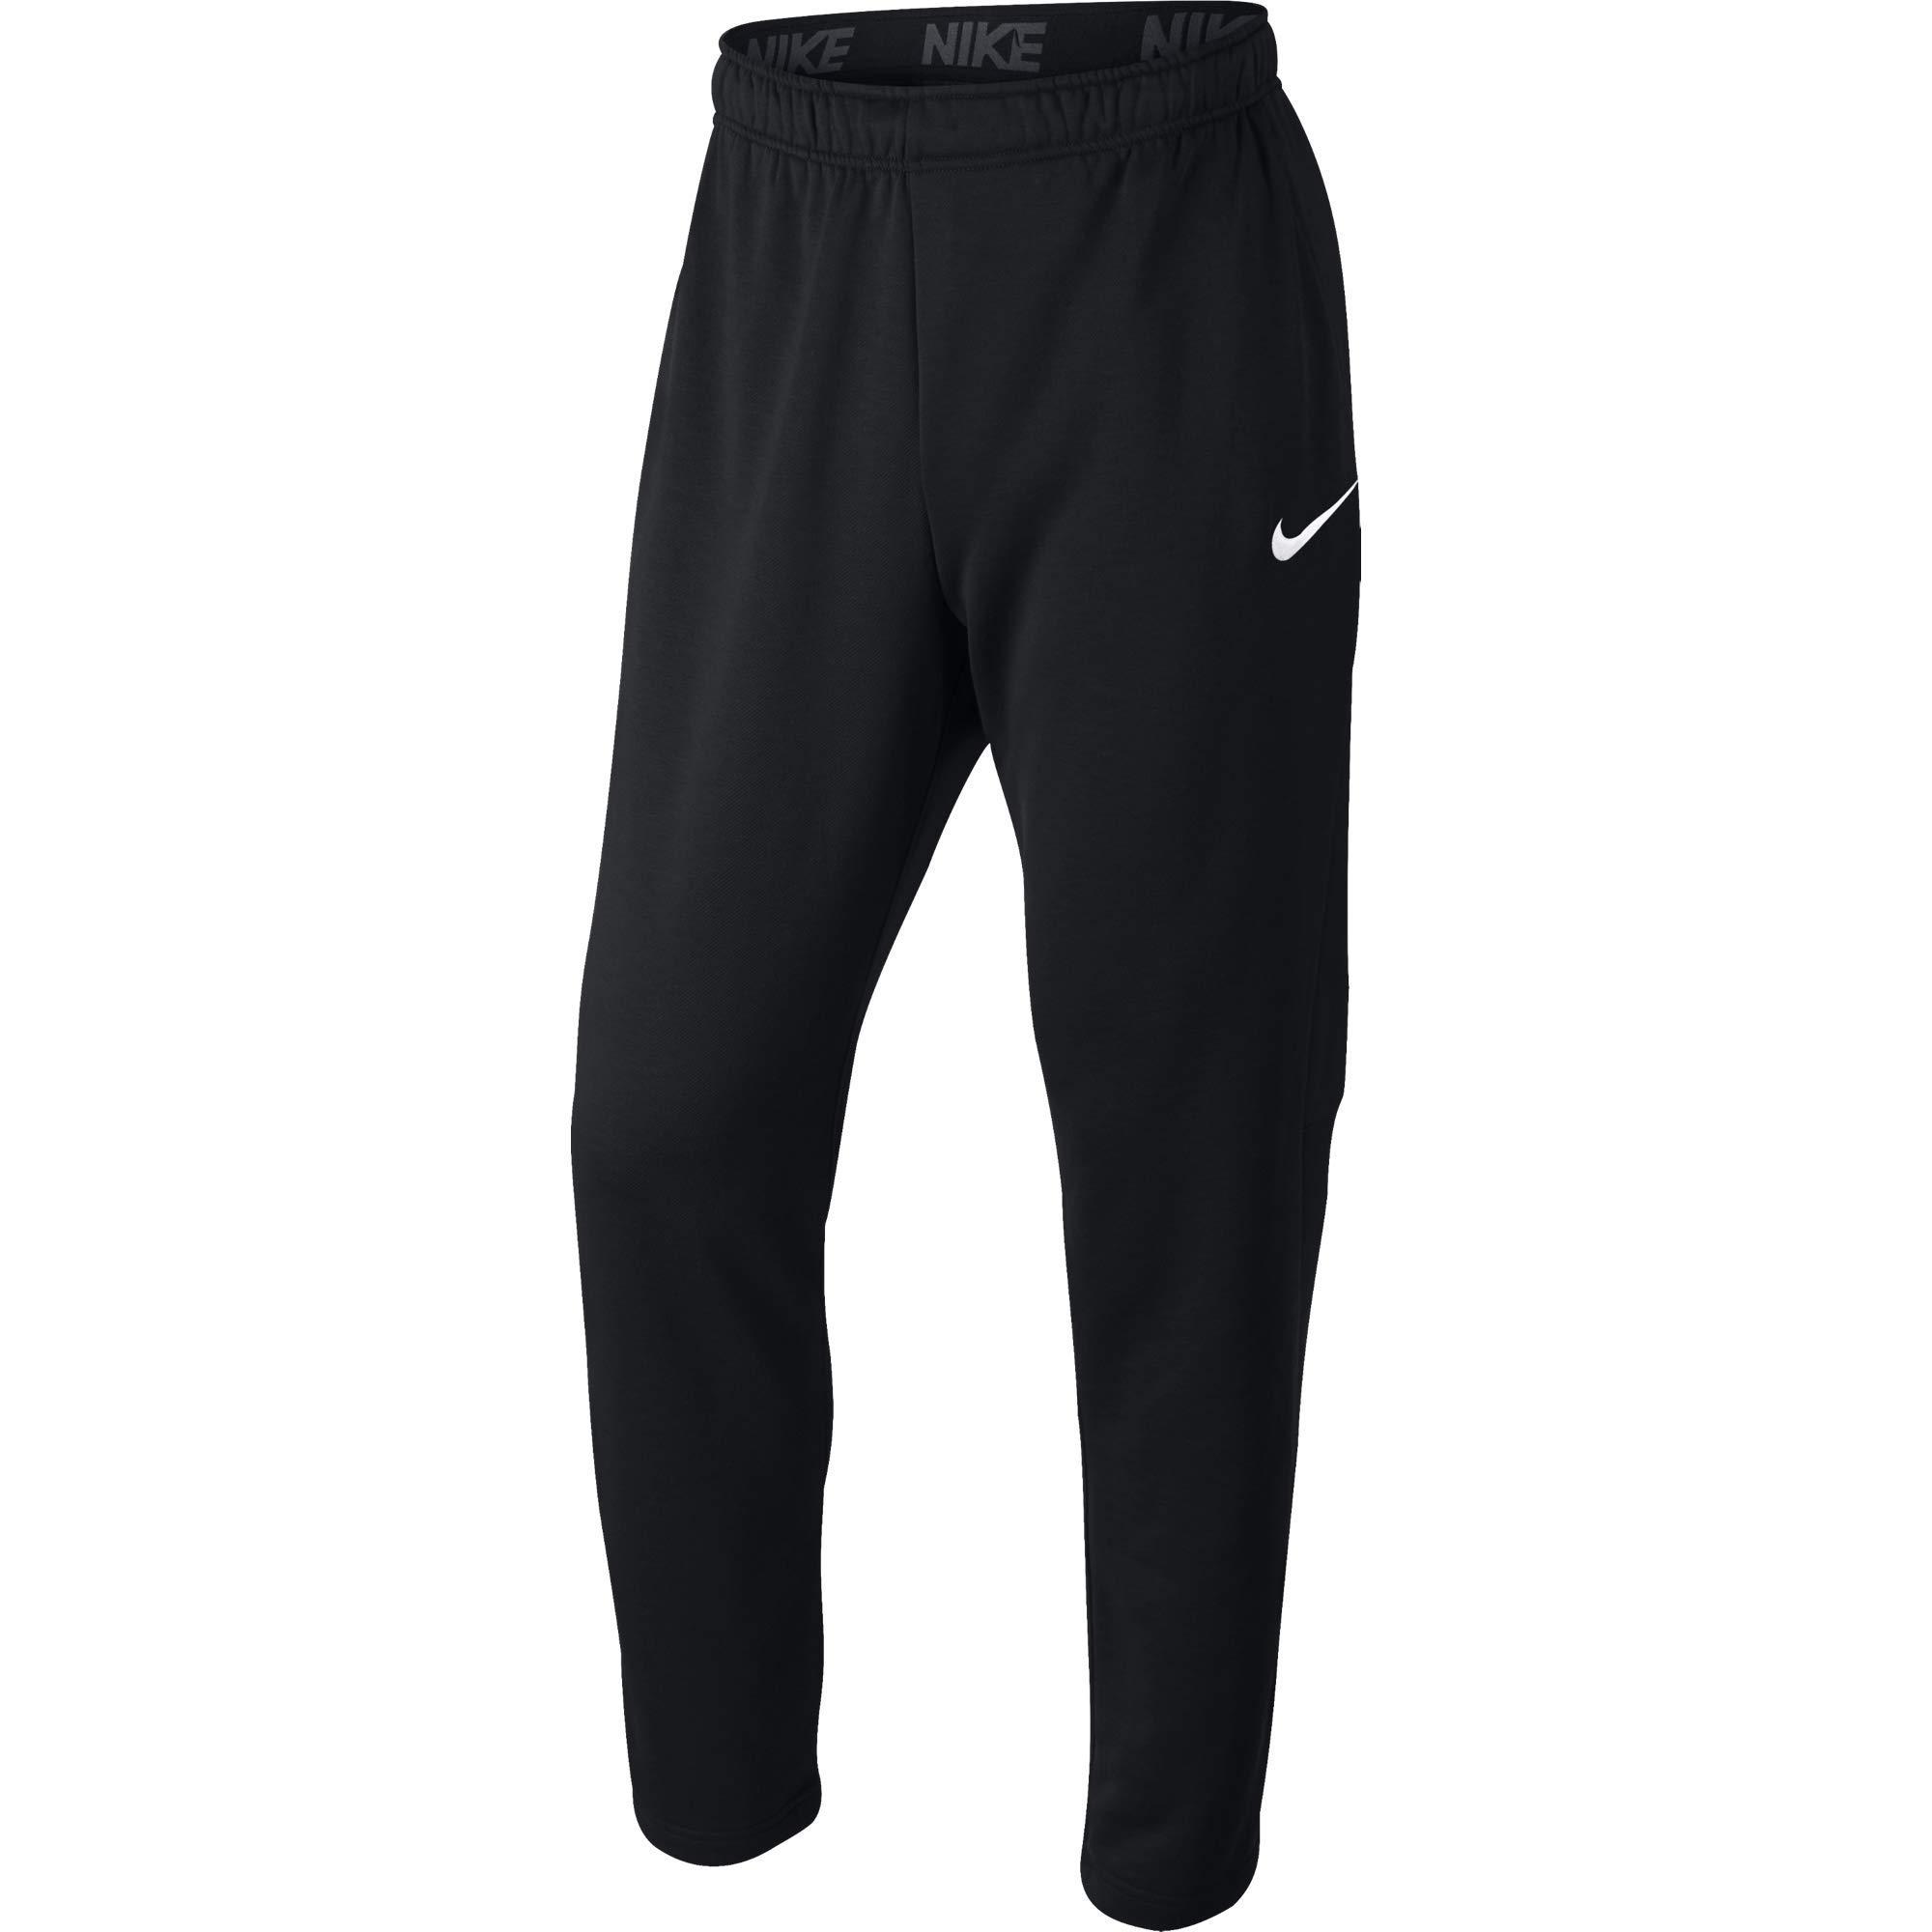 Nike Men's Dry Fleece Training Pants, Black/White, Small by Nike